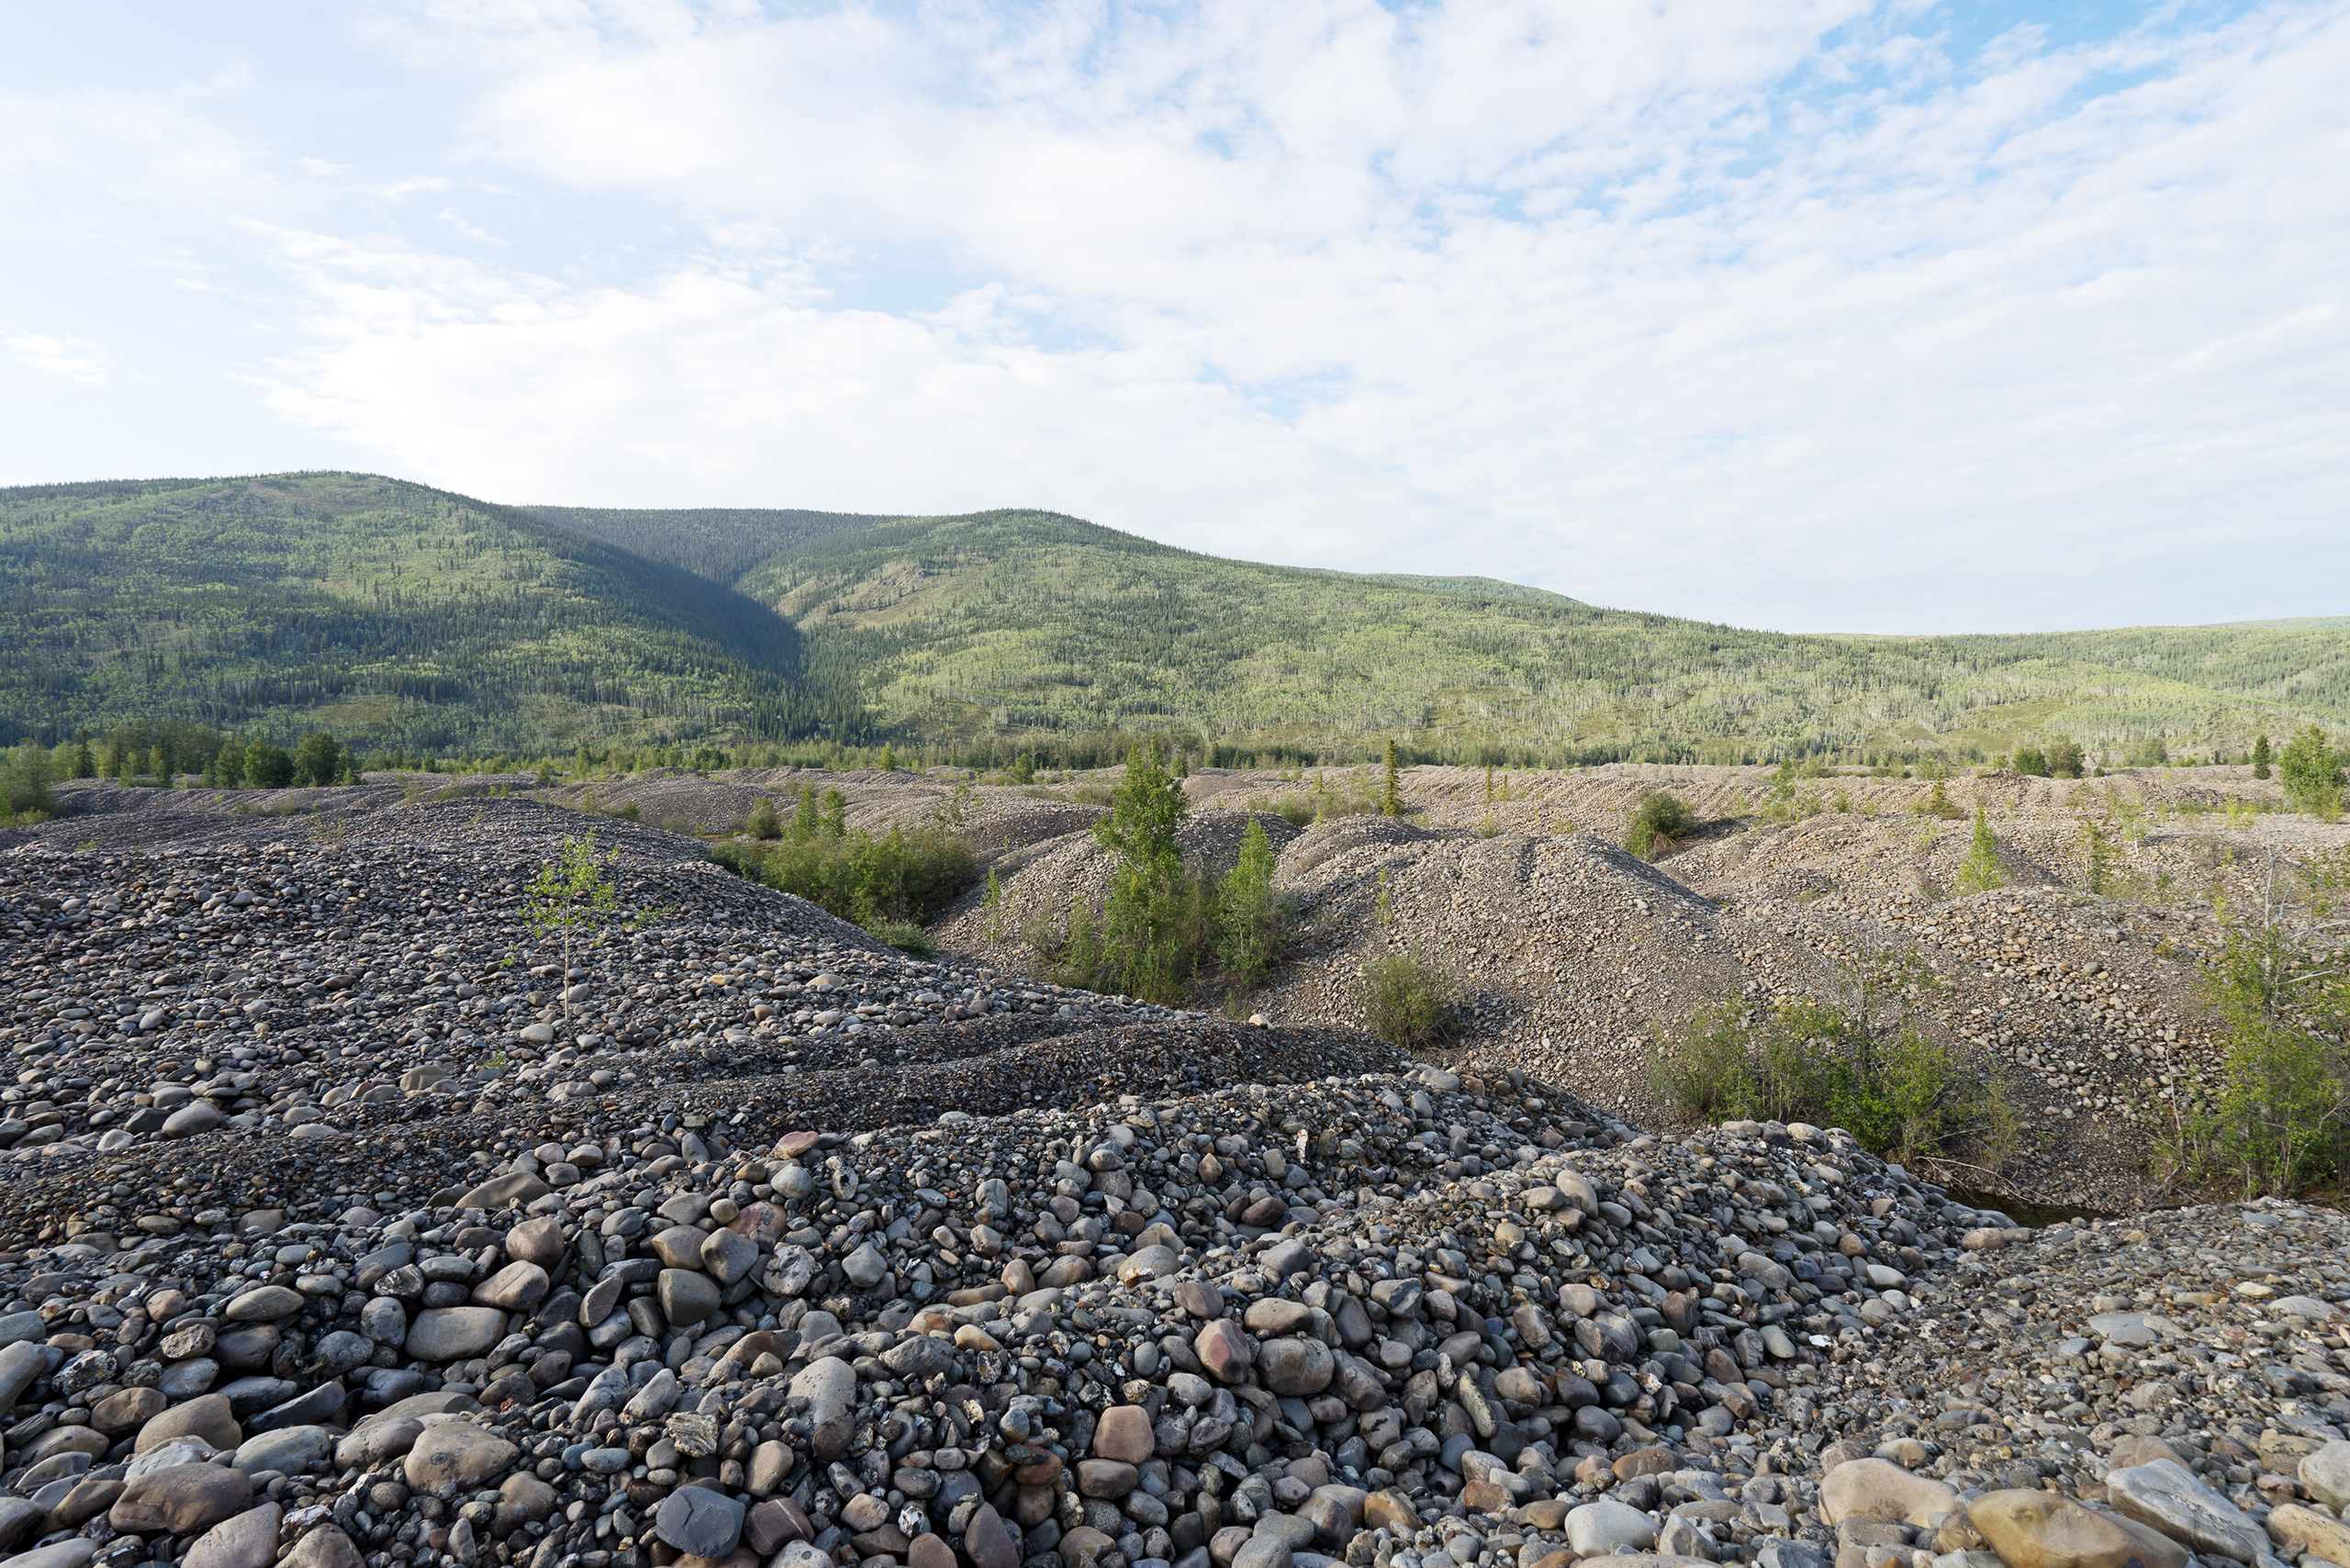 Landscape transforming (destruction) after dredging for gold | Photo: Matthias Ries